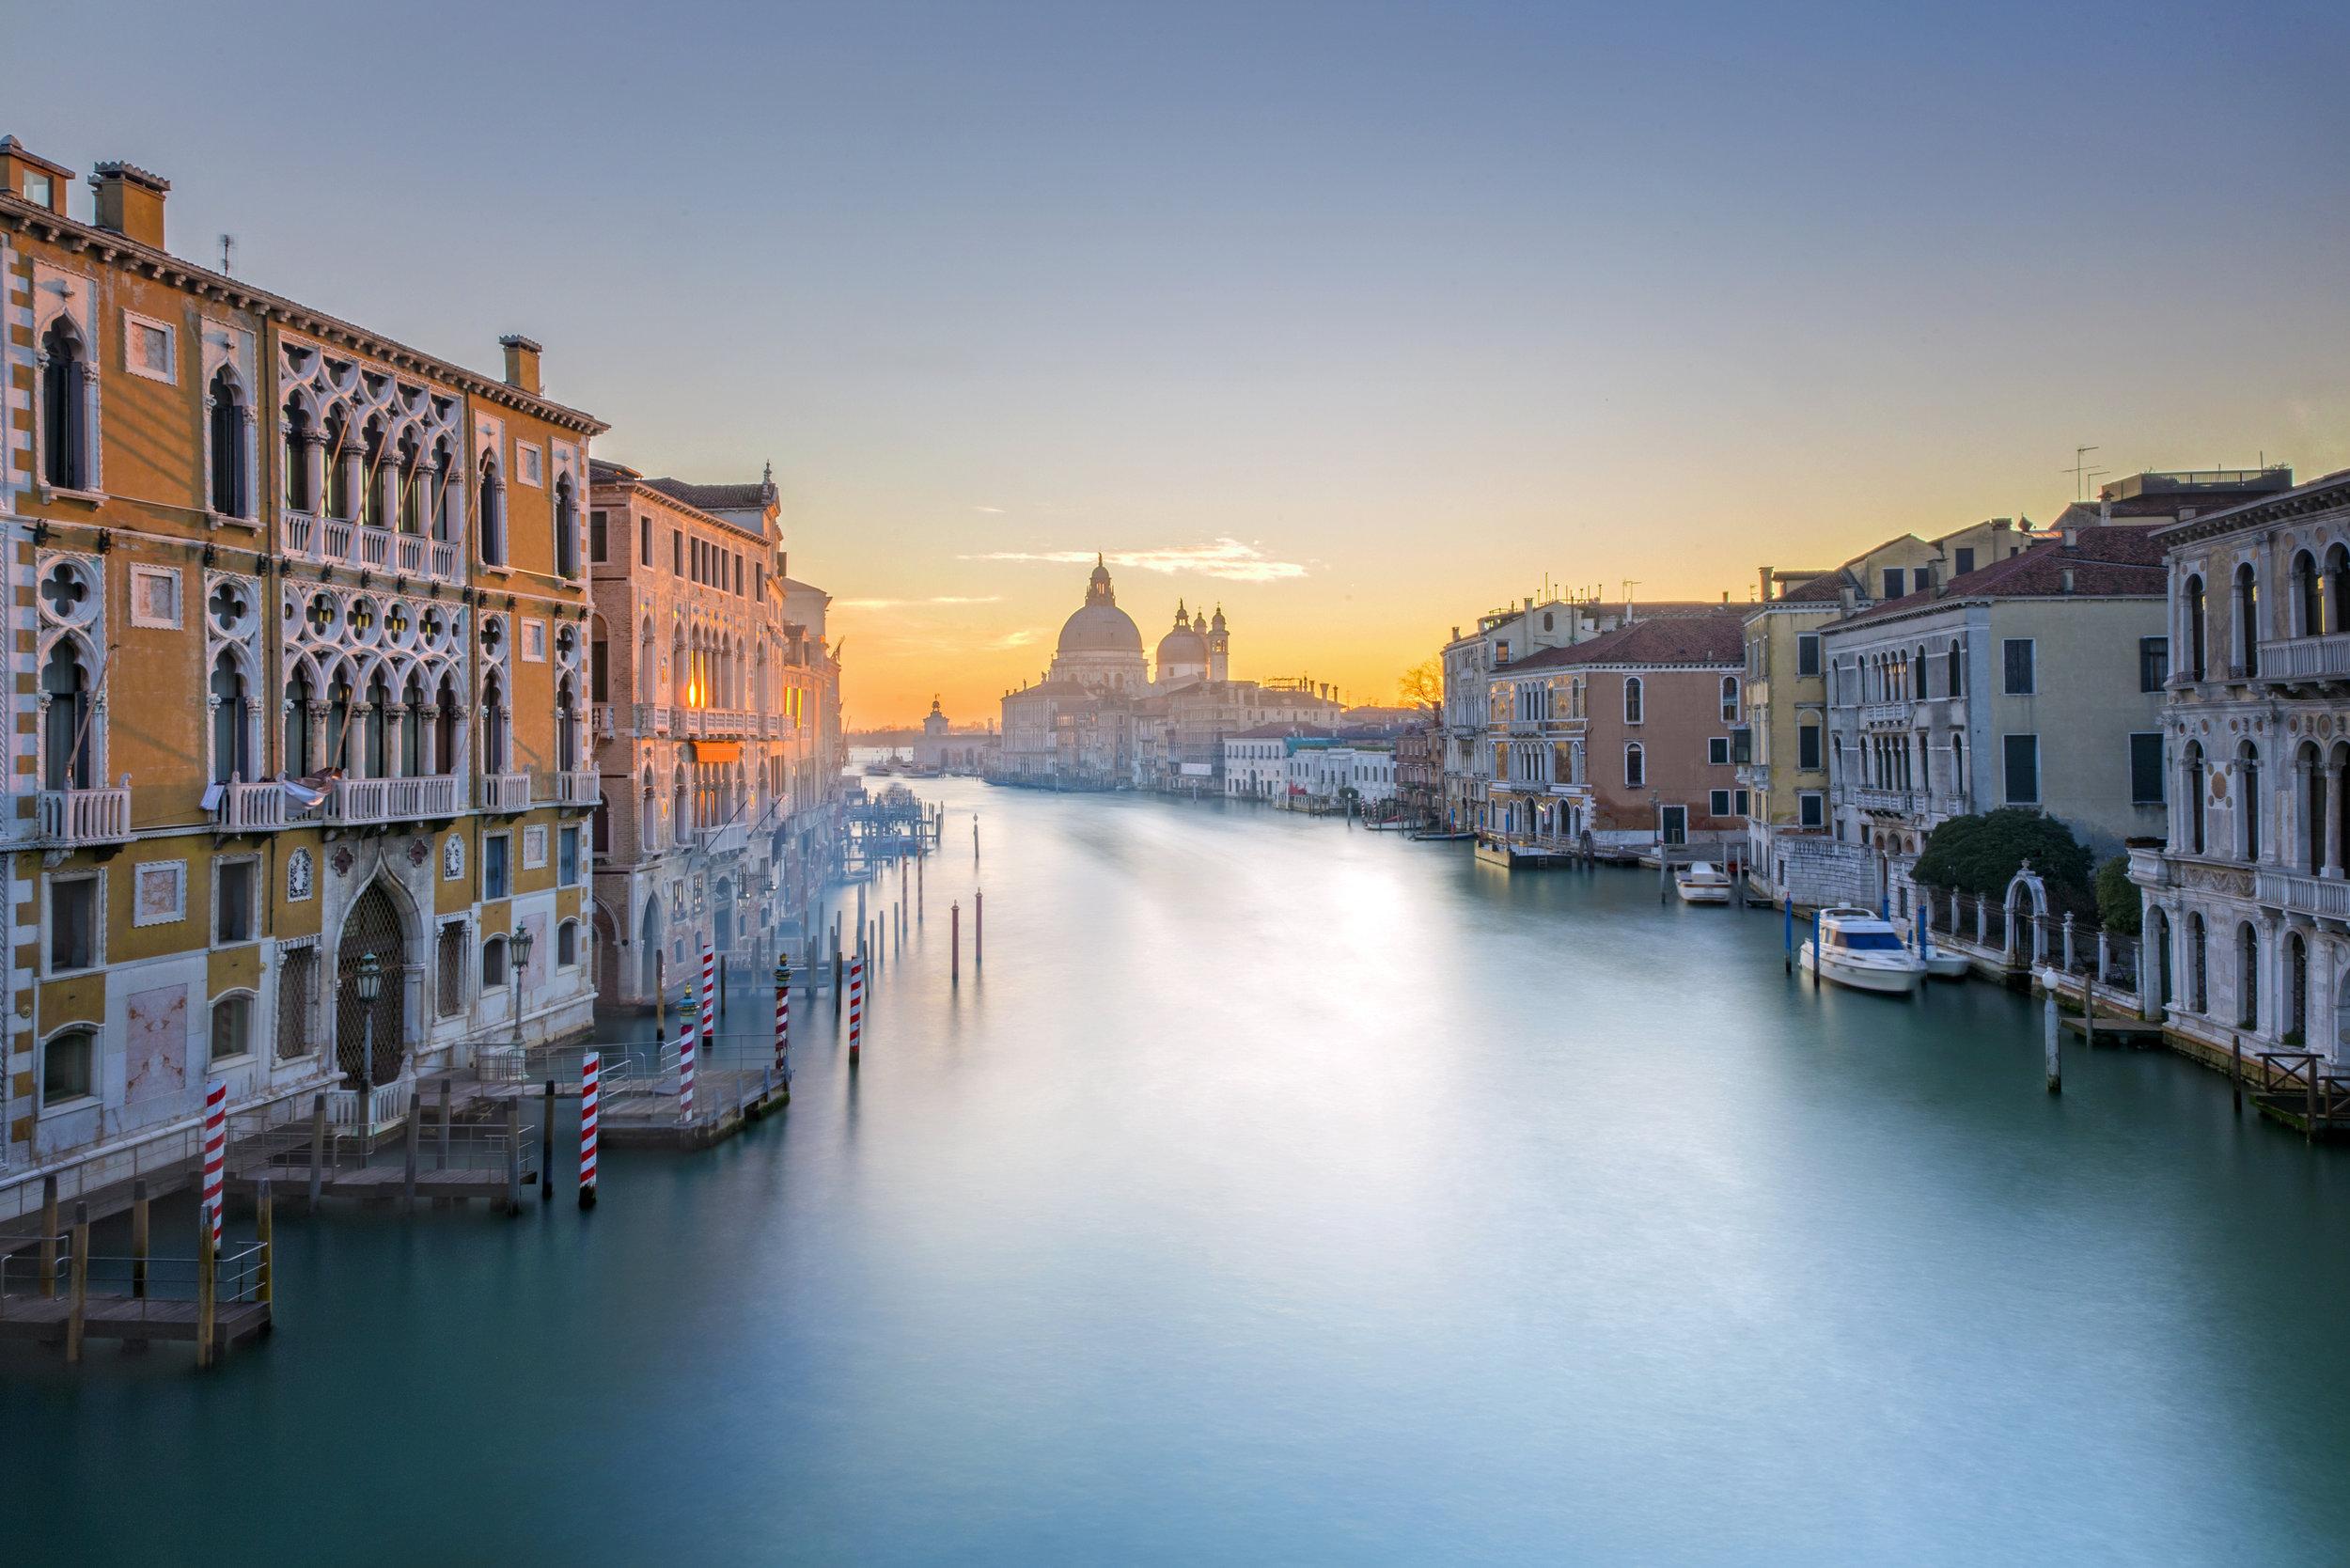 Fiola at Dopolavoro Venezia - now open / venice, italy